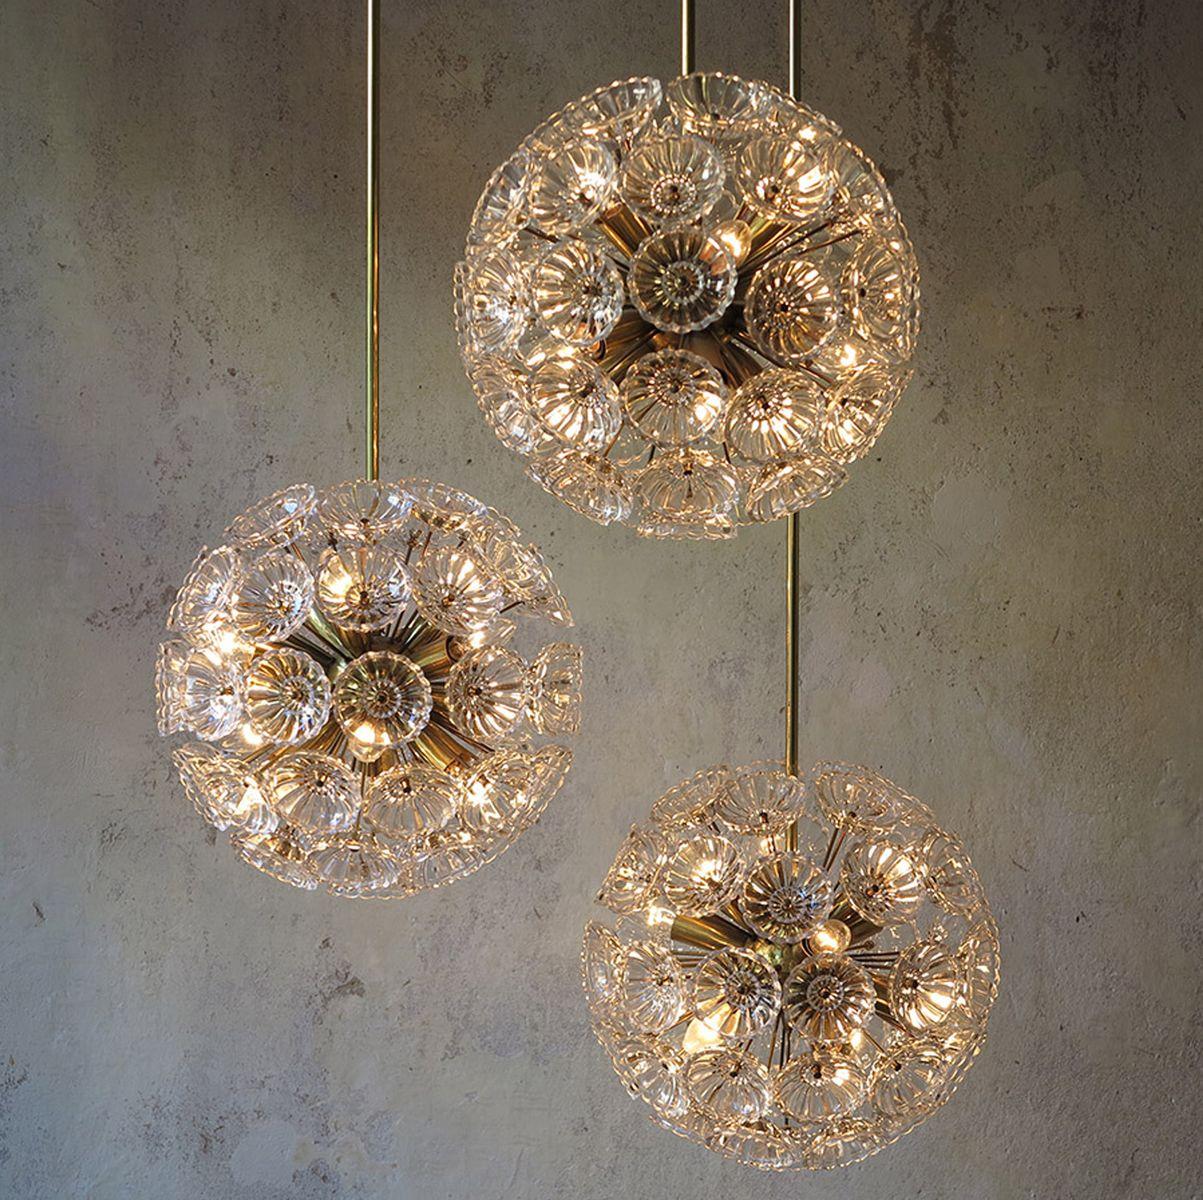 Sputnik christmas ornaments - Sold Out